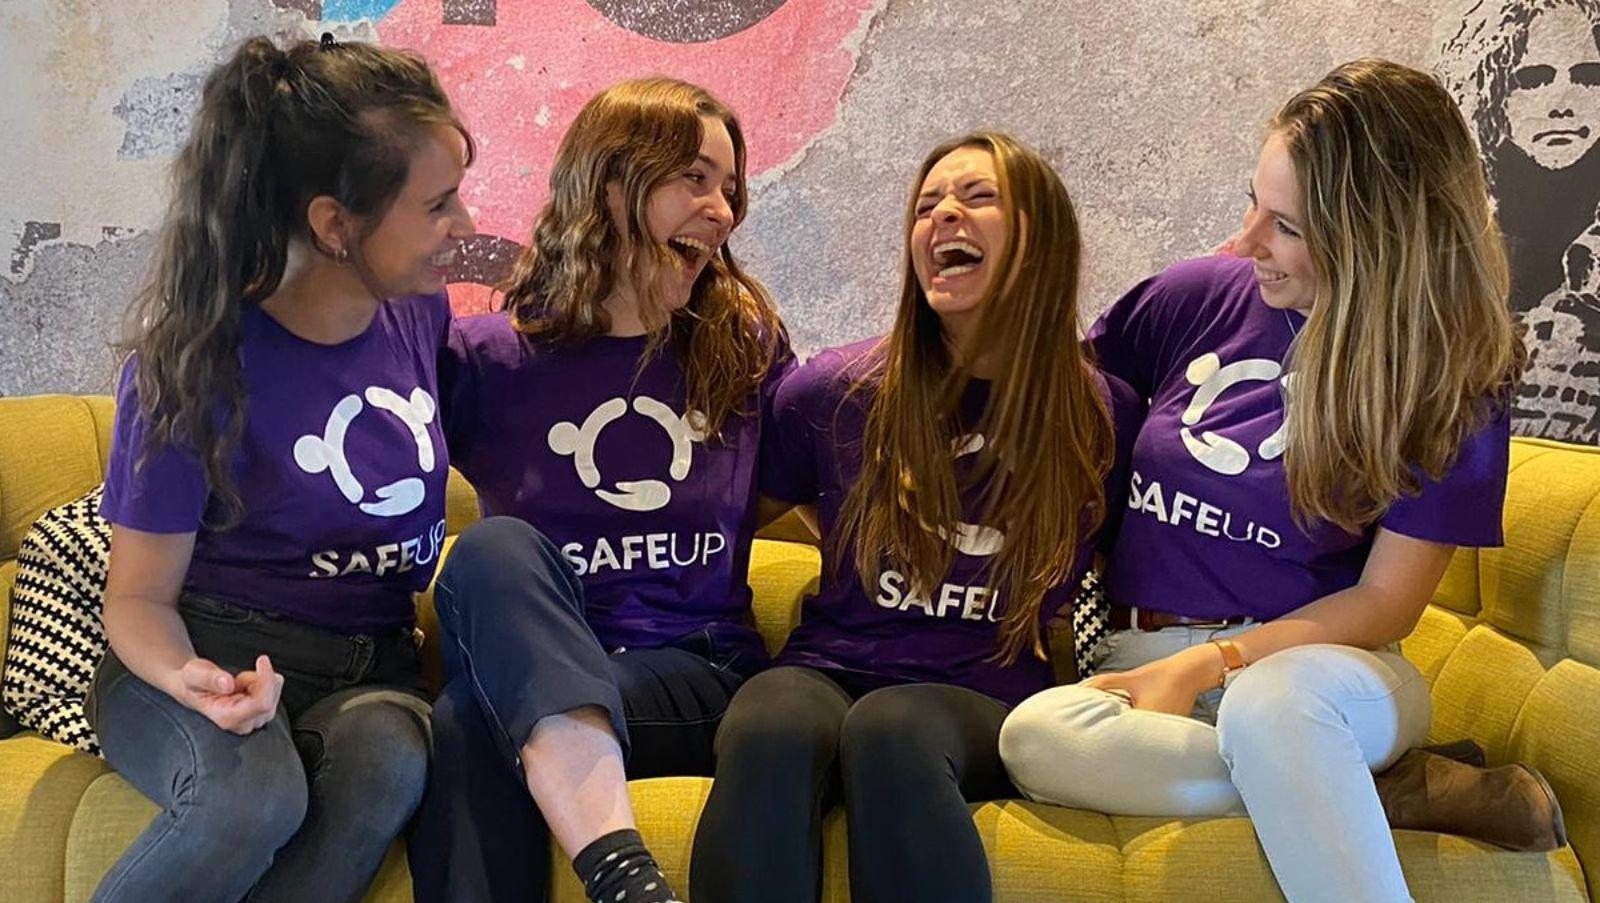 The startup ensuring that no woman walks alone